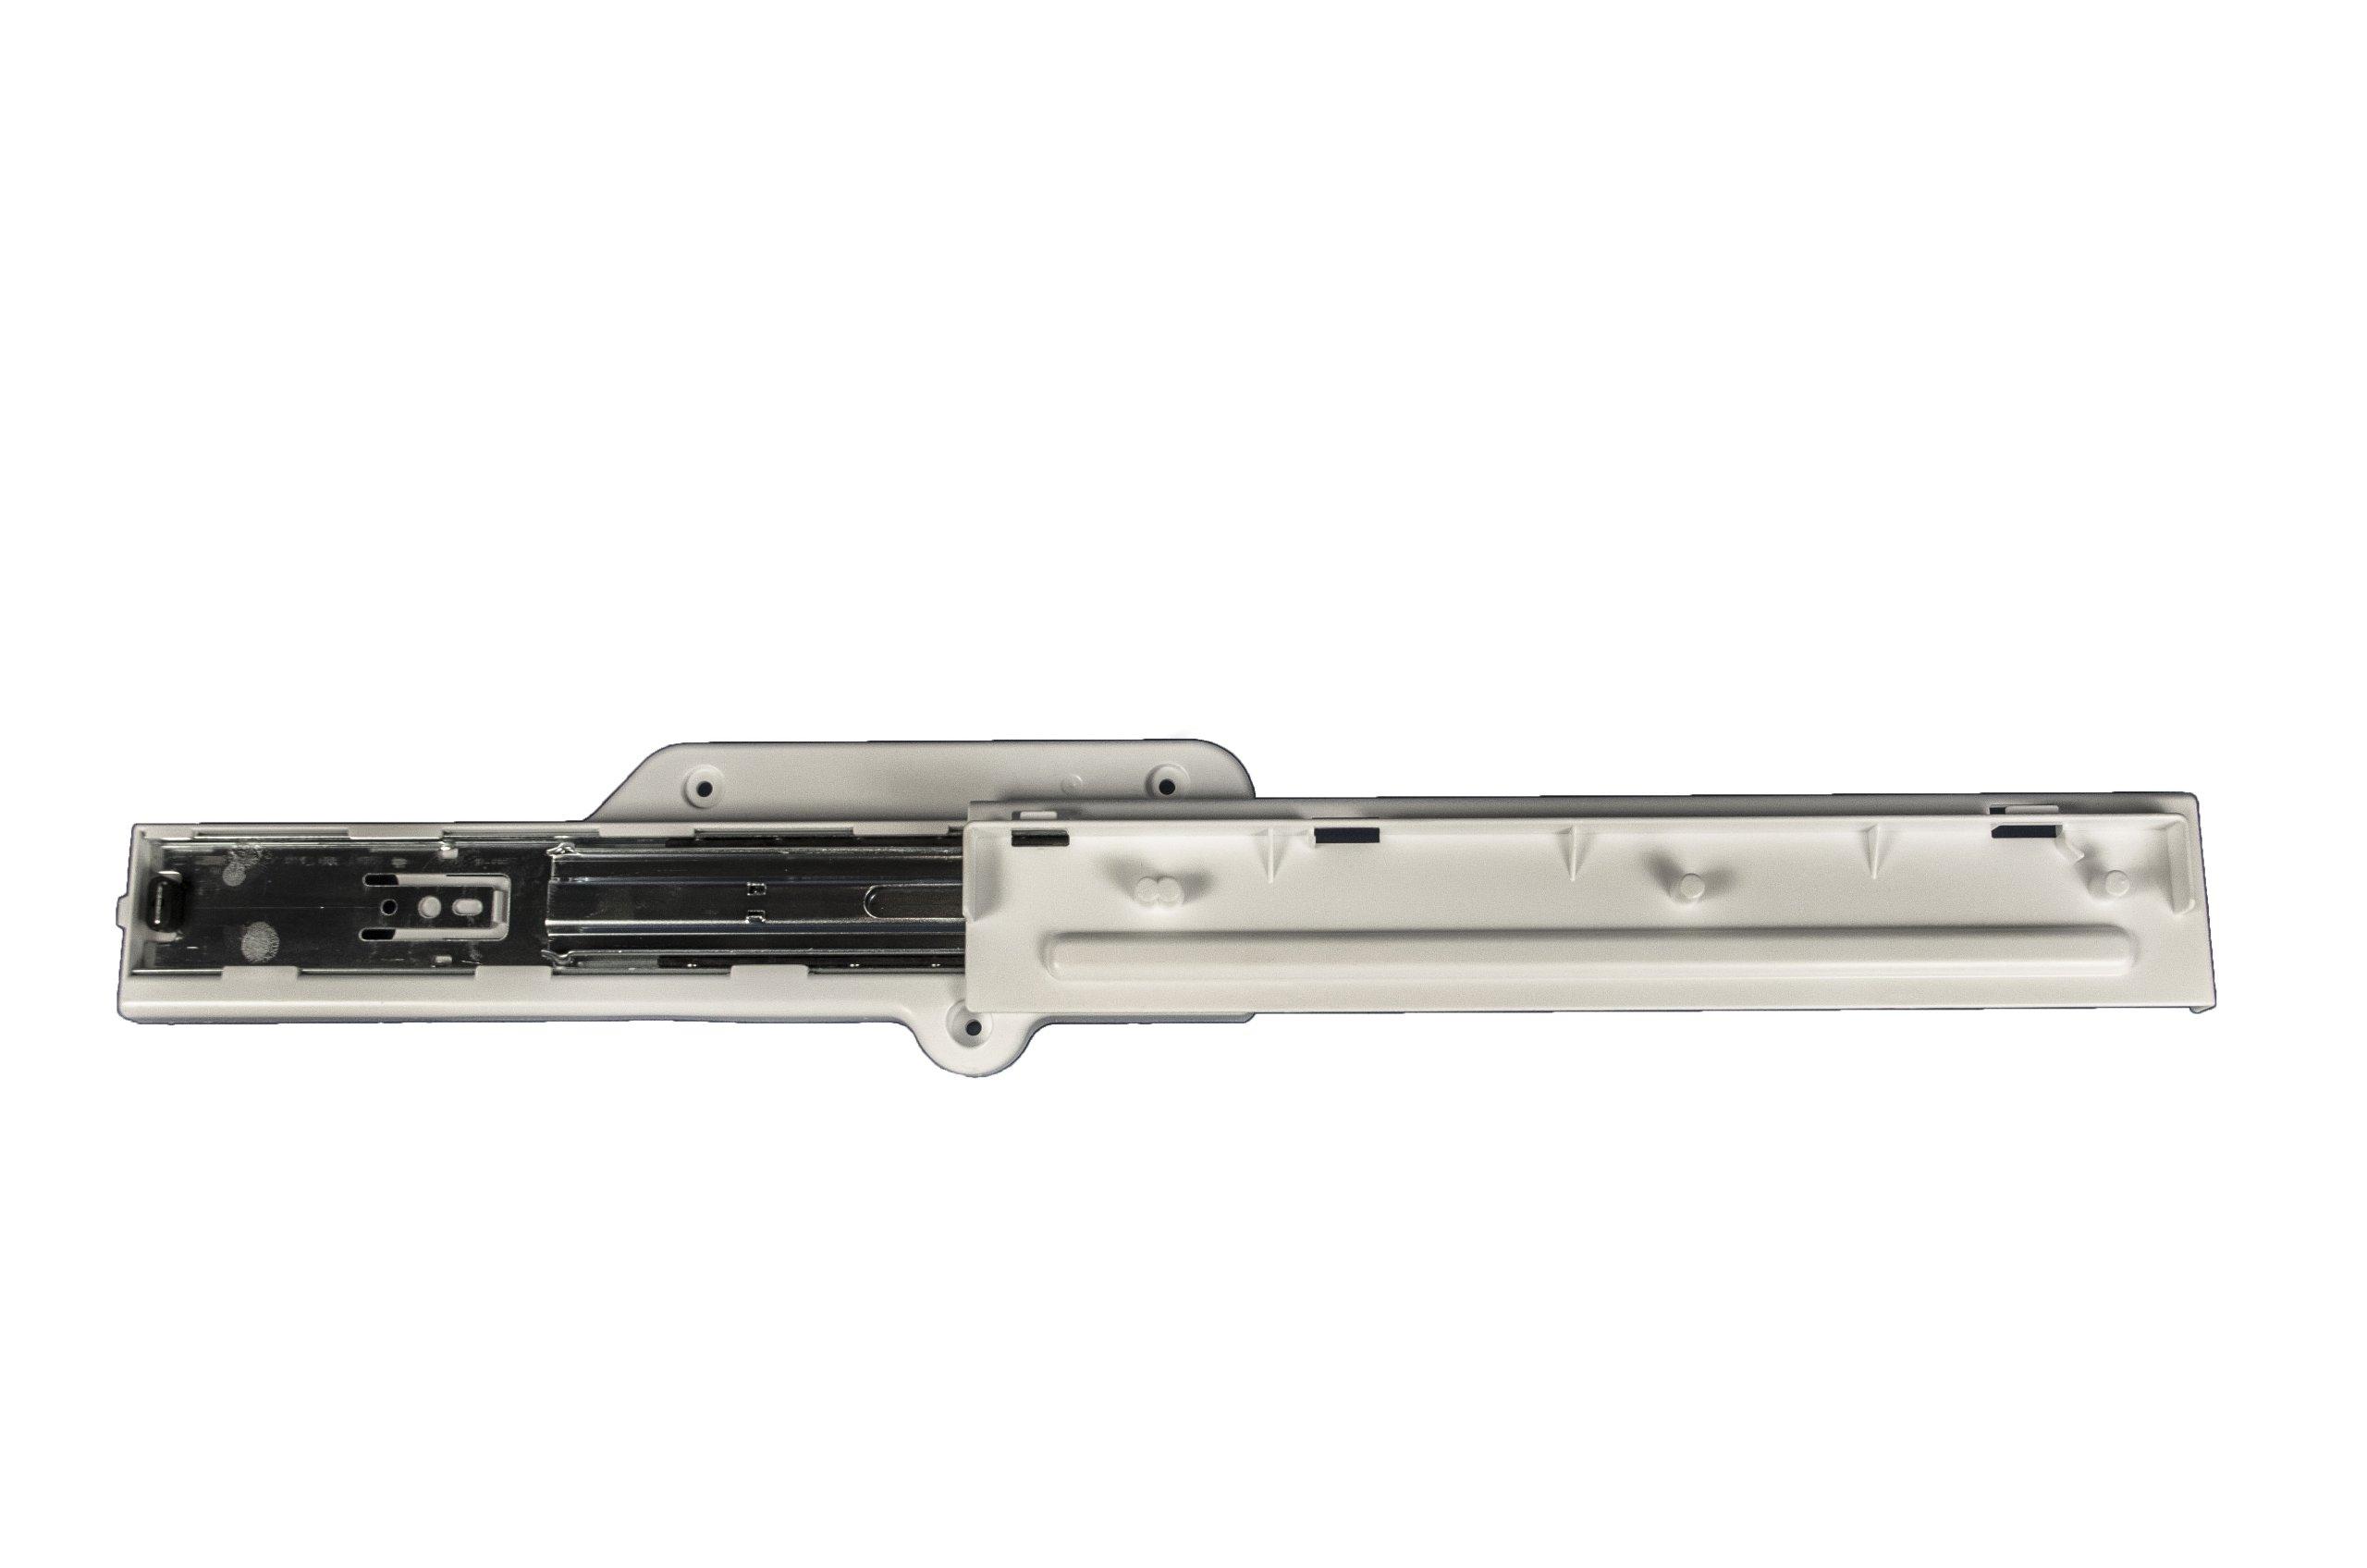 LG Electronics 4975JJ2028C Freezer Drawer Slide Rail, Right Side